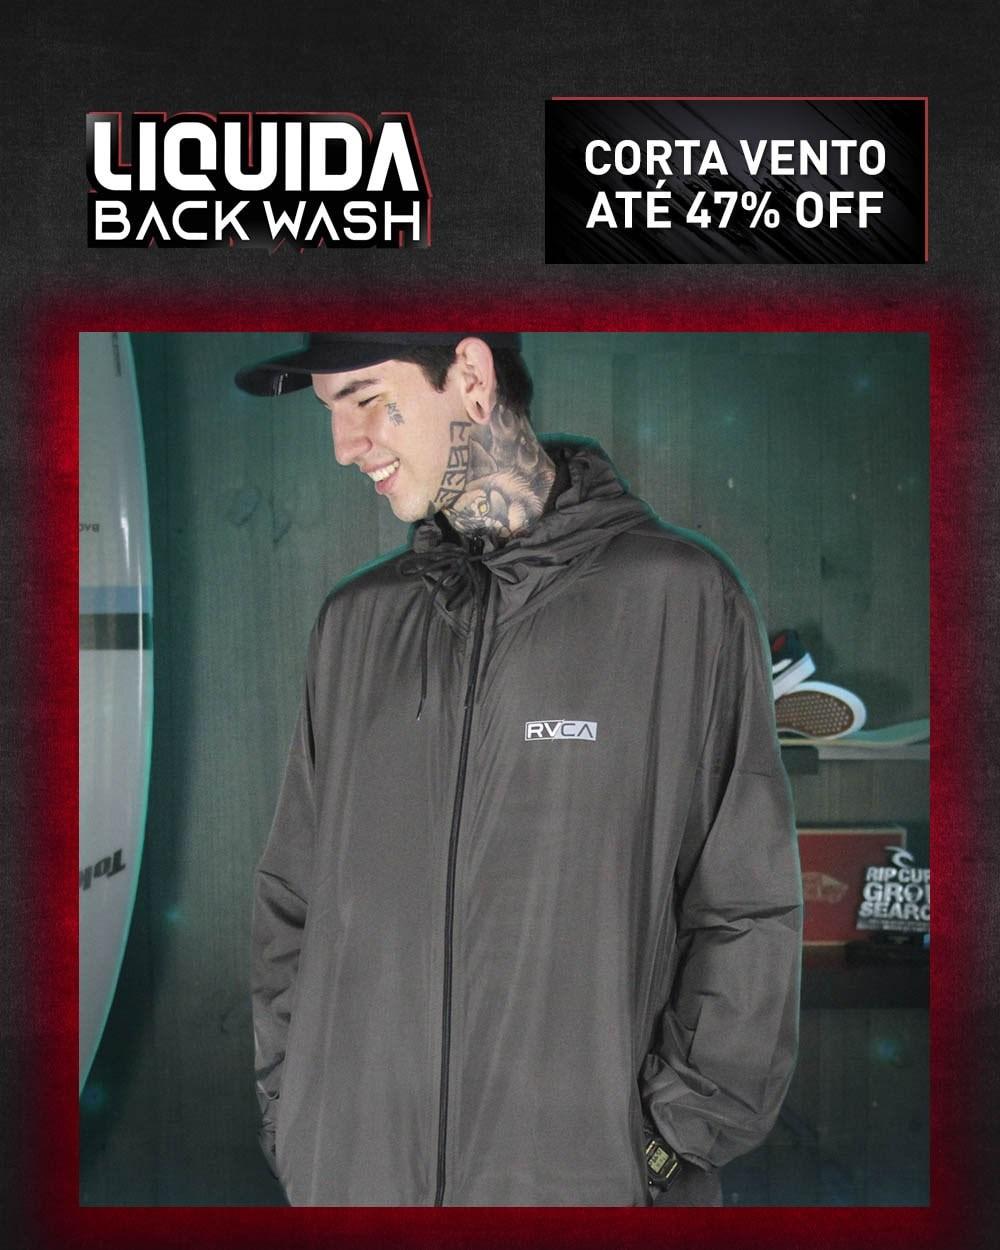 Liquida Back Wash mobile